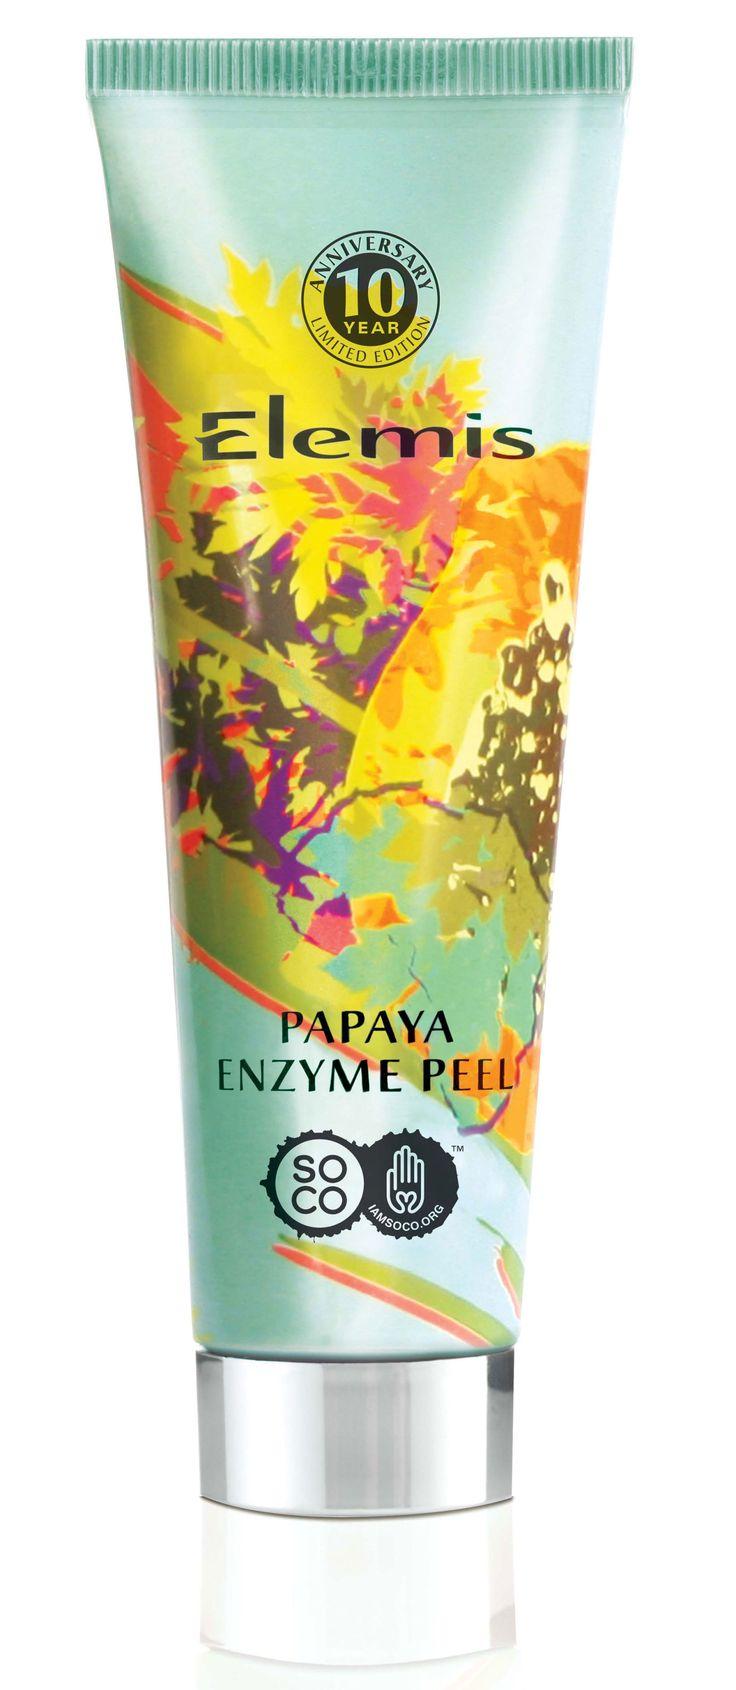 Elemis Papaya Enzyme Peel  - Redbook.com